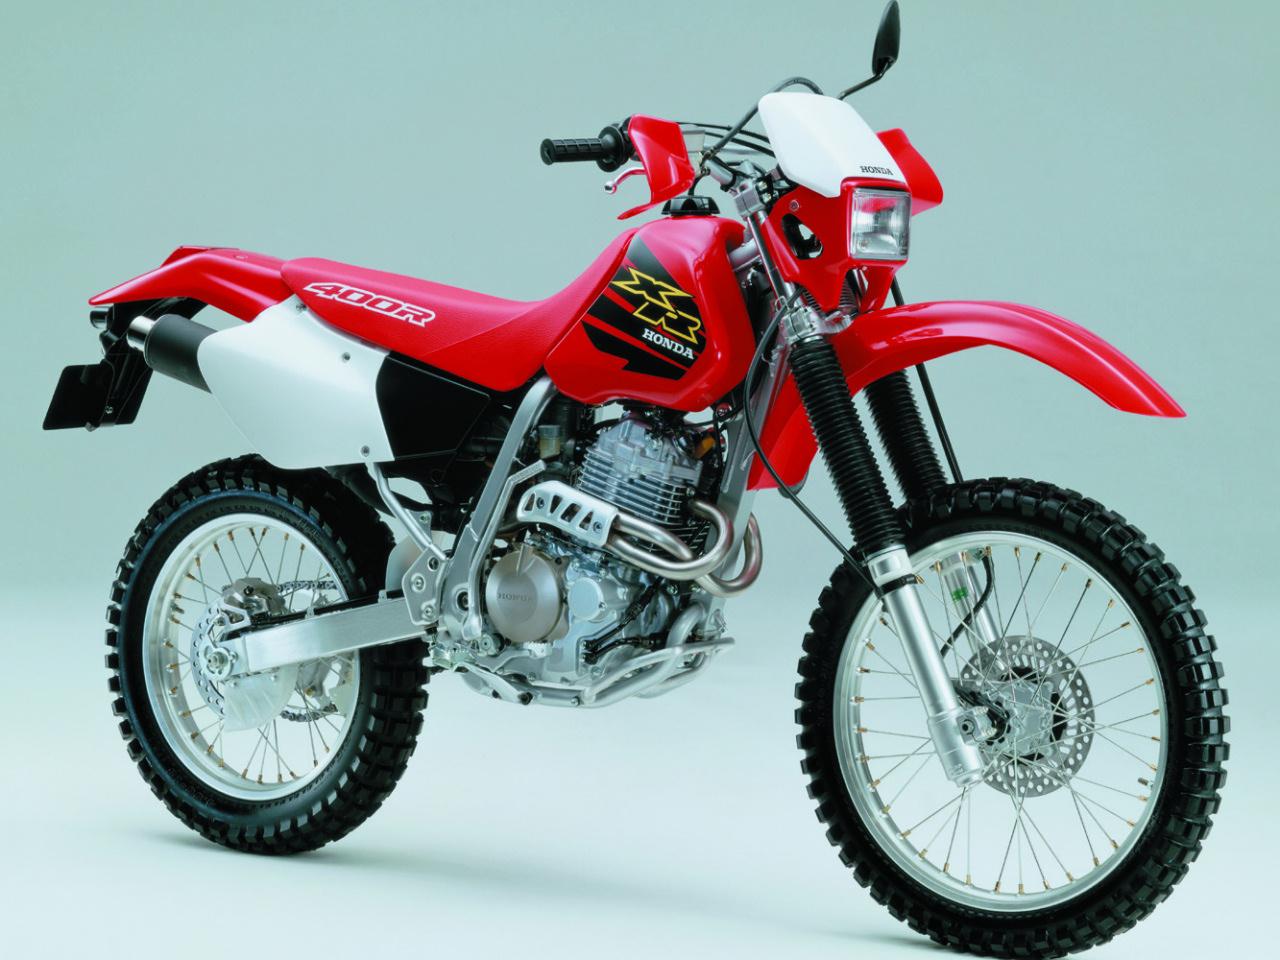 Hjc Rpha 11 >> Honda CRF450 Rally